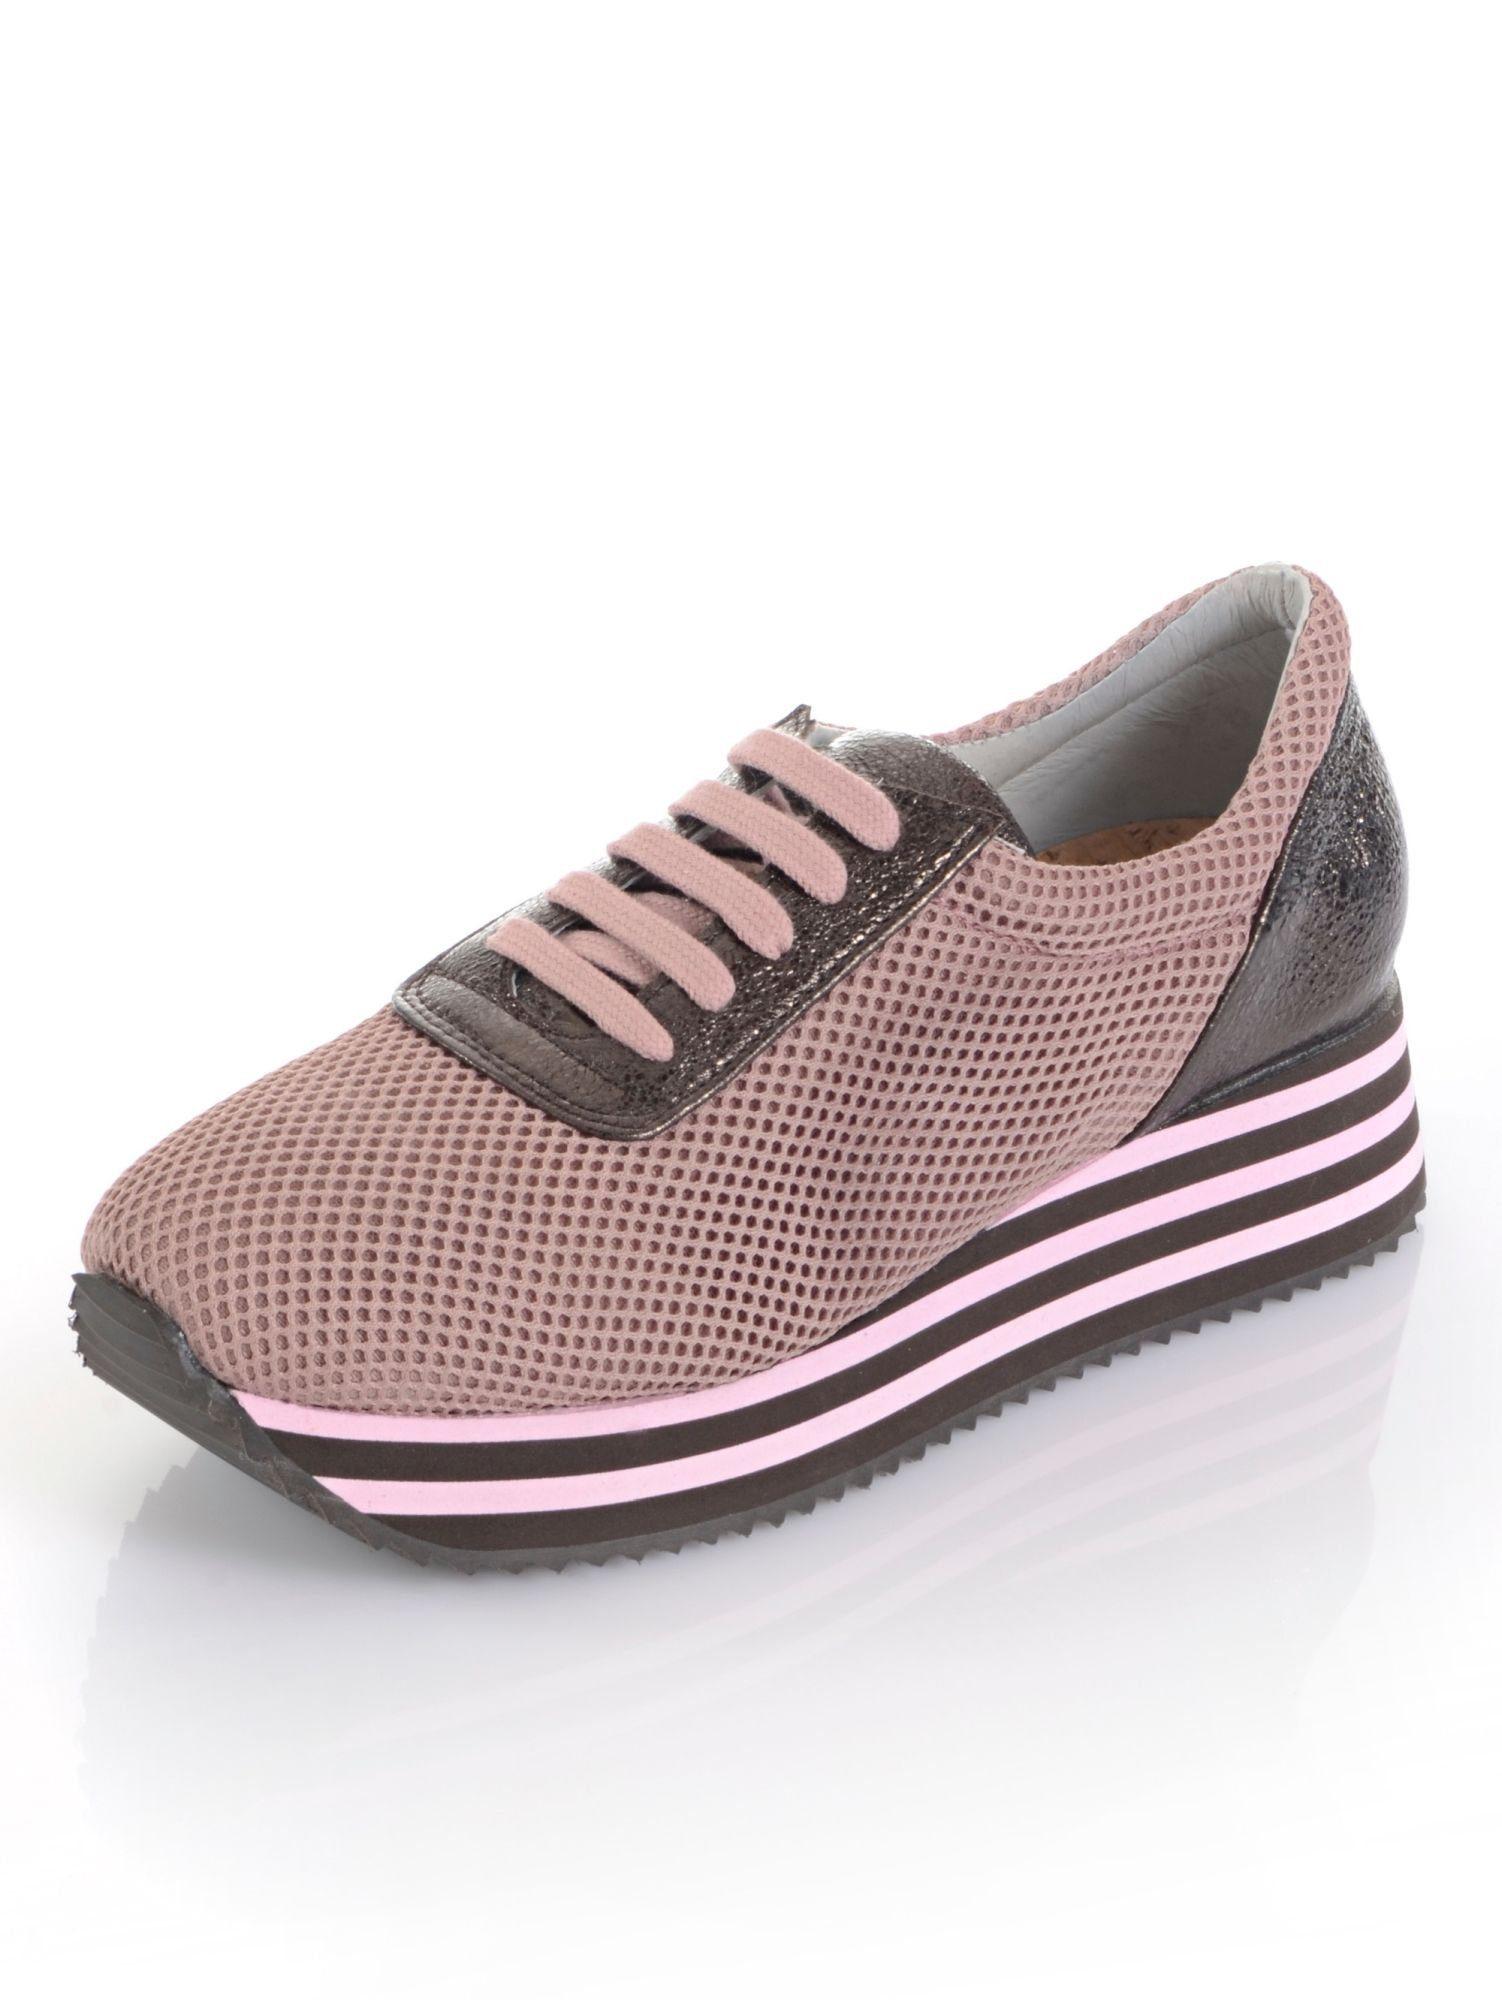 Alba Moda Sneaker im Mesh-Look online kaufen  altrosé#ft5_slash#braun